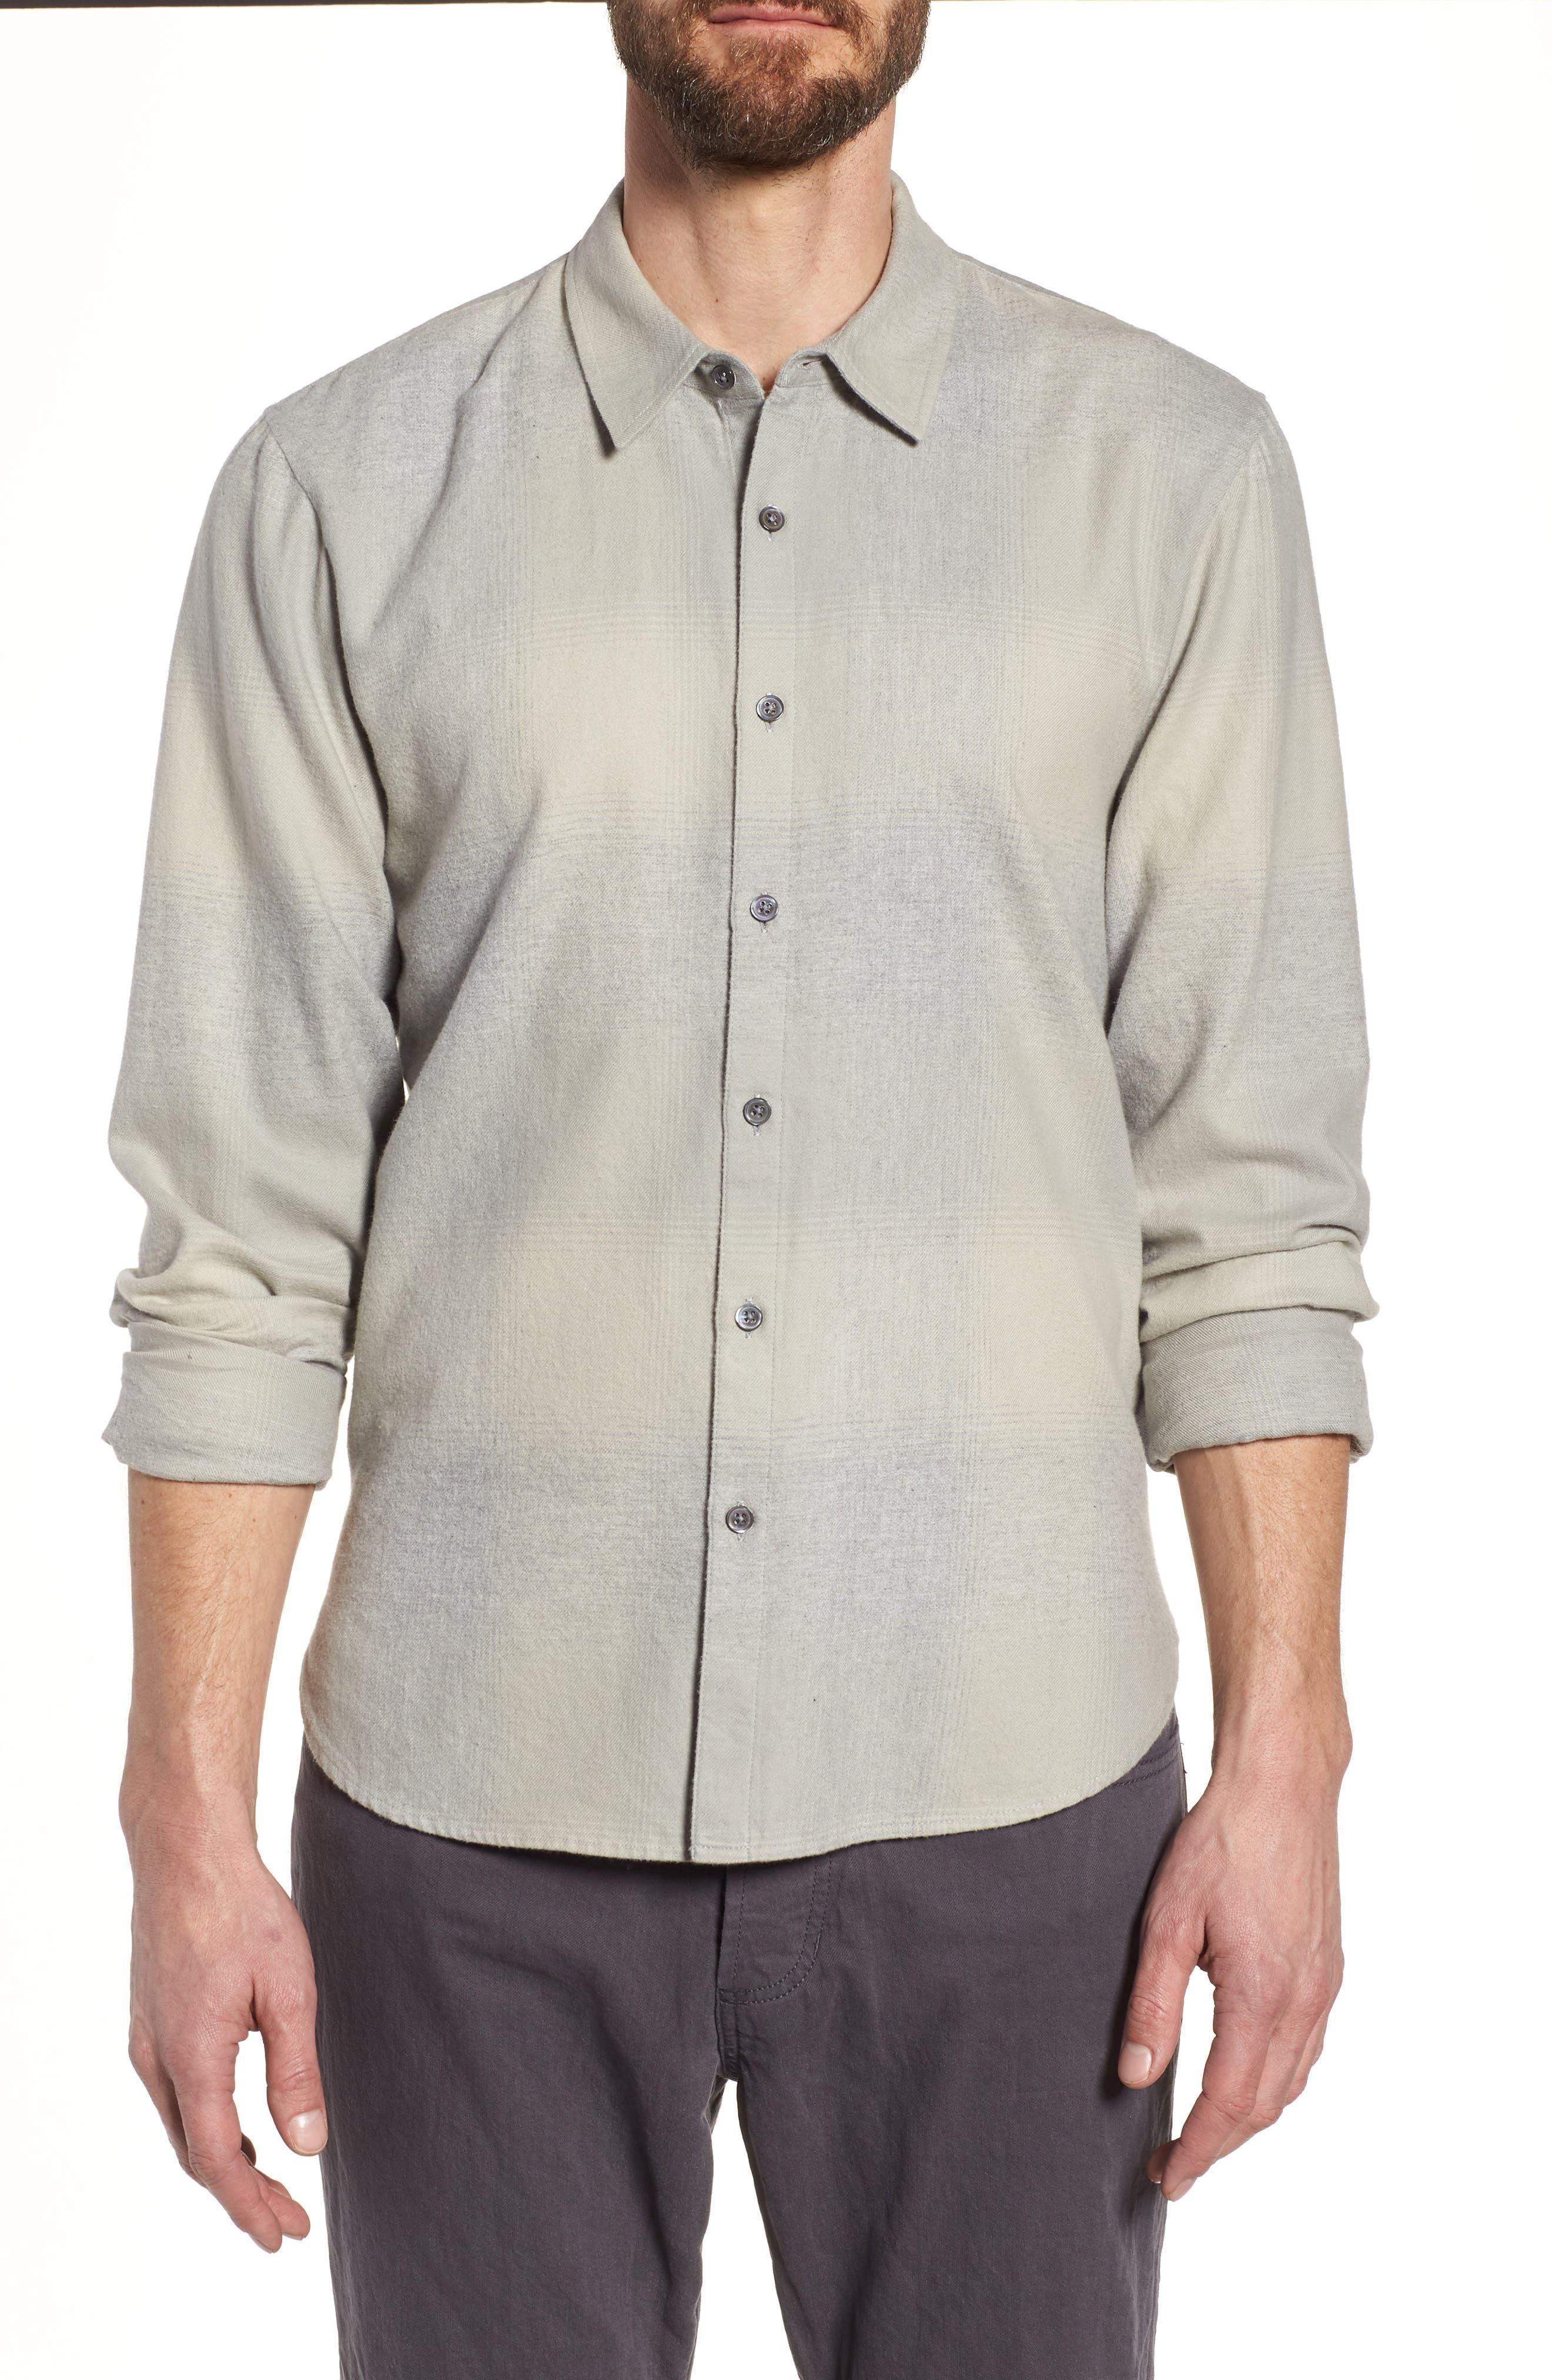 Alternate Image 1 Selected - James Perse Ghost Regular Fit Plaid Sport Shirt